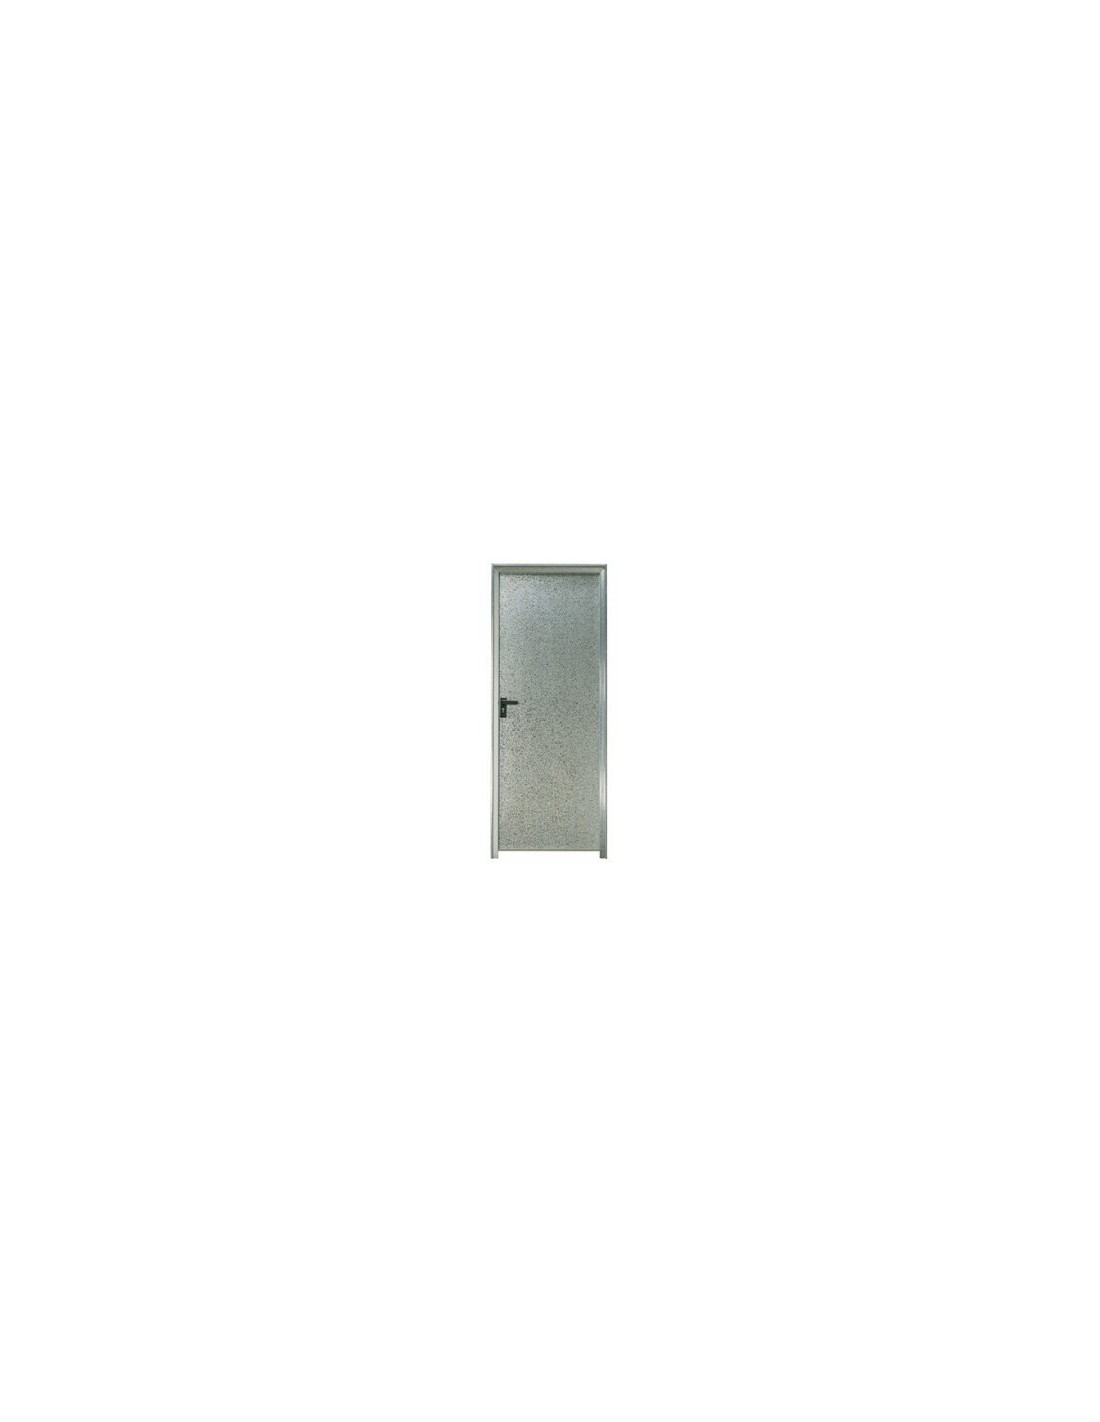 Puerta chapa galvanizada 100 x 2 m ciega marco de 90 mm - Puerta chapa galvanizada ...